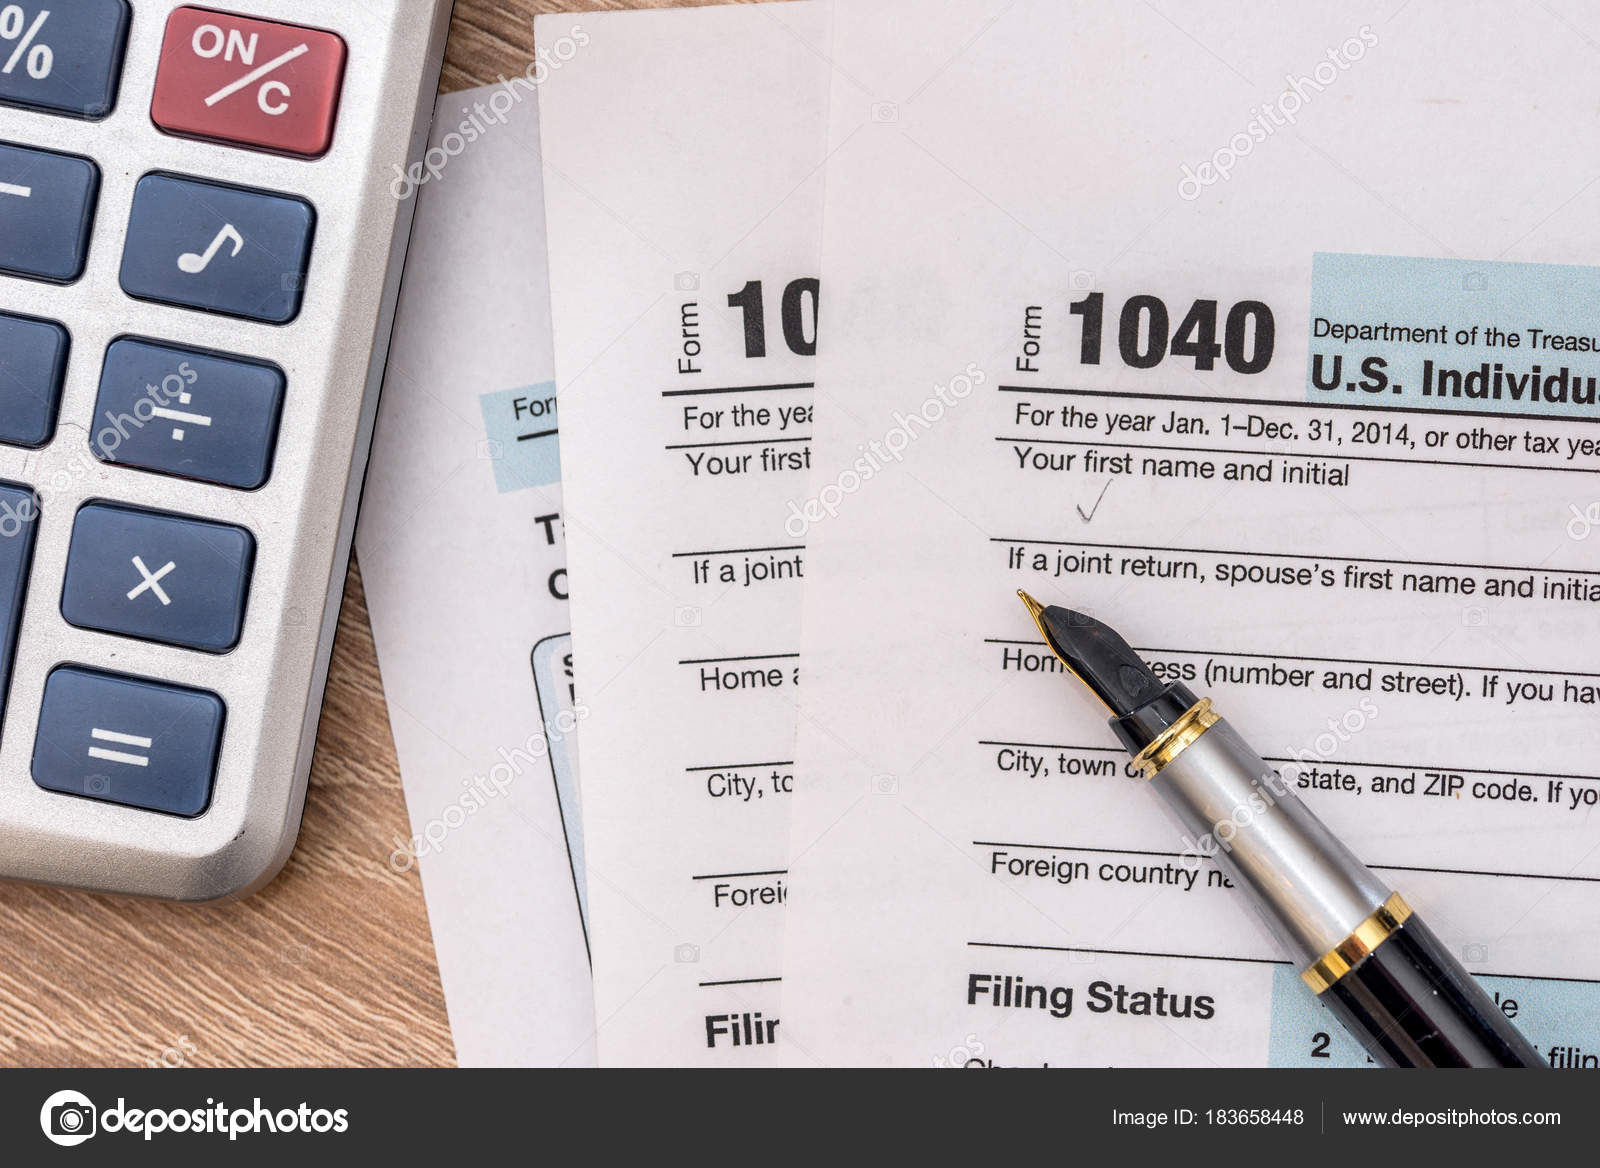 form 1040 calculator  6 Year Tax Form 6 Calculator Pen — Stock Photo ...